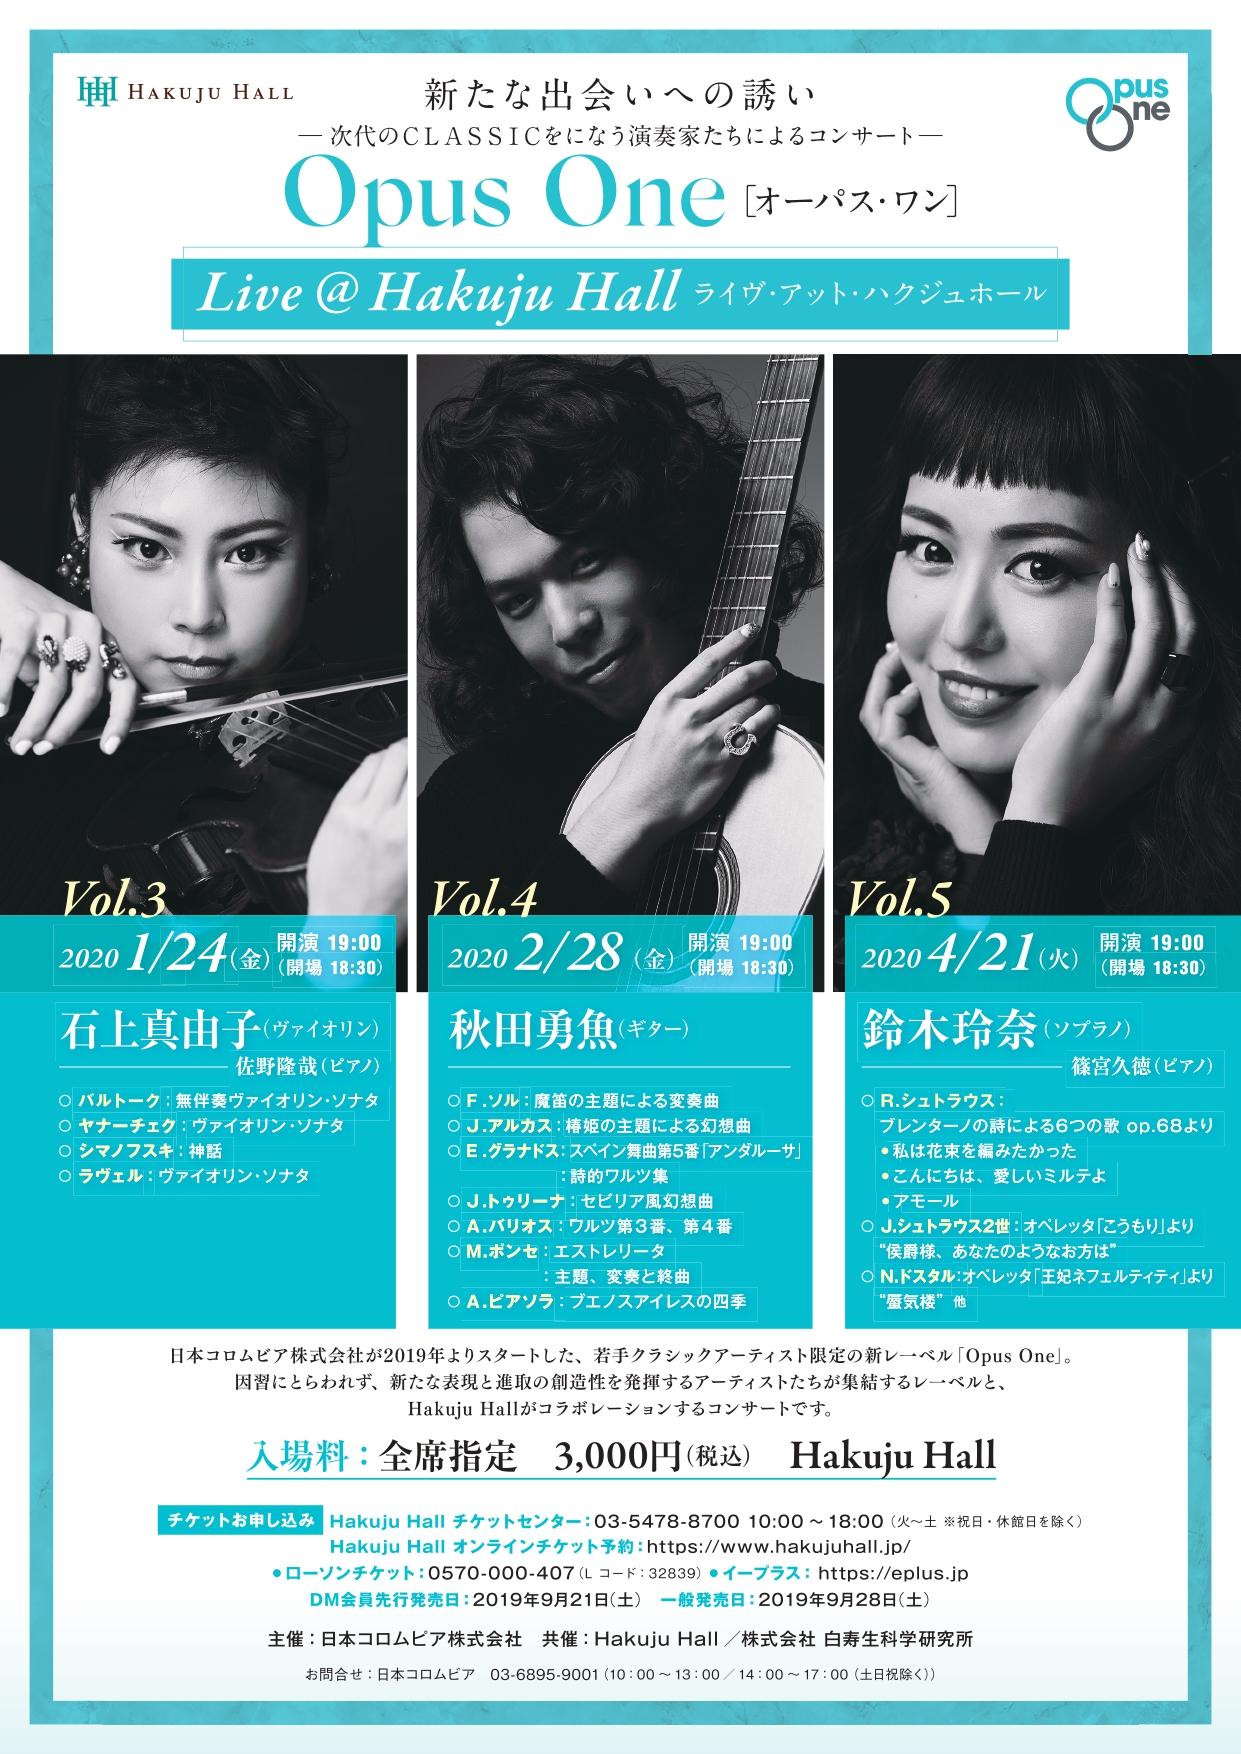 Live @ Hakuju Hall Vol.3 石上真由子、Vol.4 秋田勇魚、Vol.5 鈴木玲奈